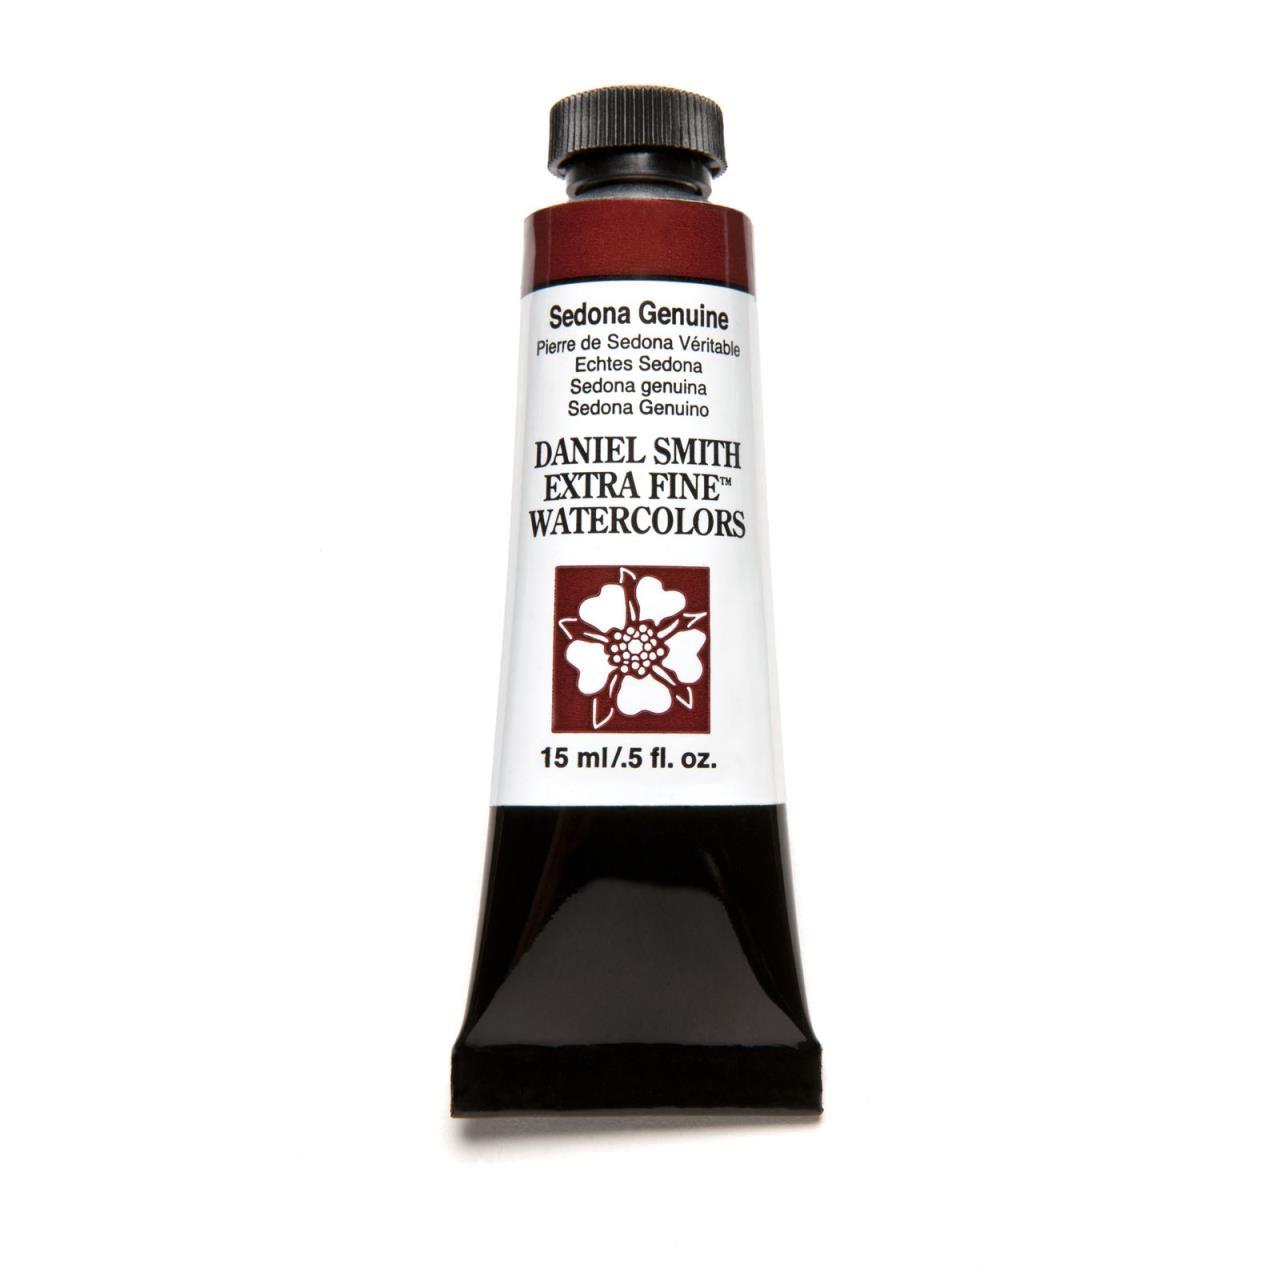 Sedona Genuine, DANIEL SMITH Extra Fine Watercolors 15ml Tubes -